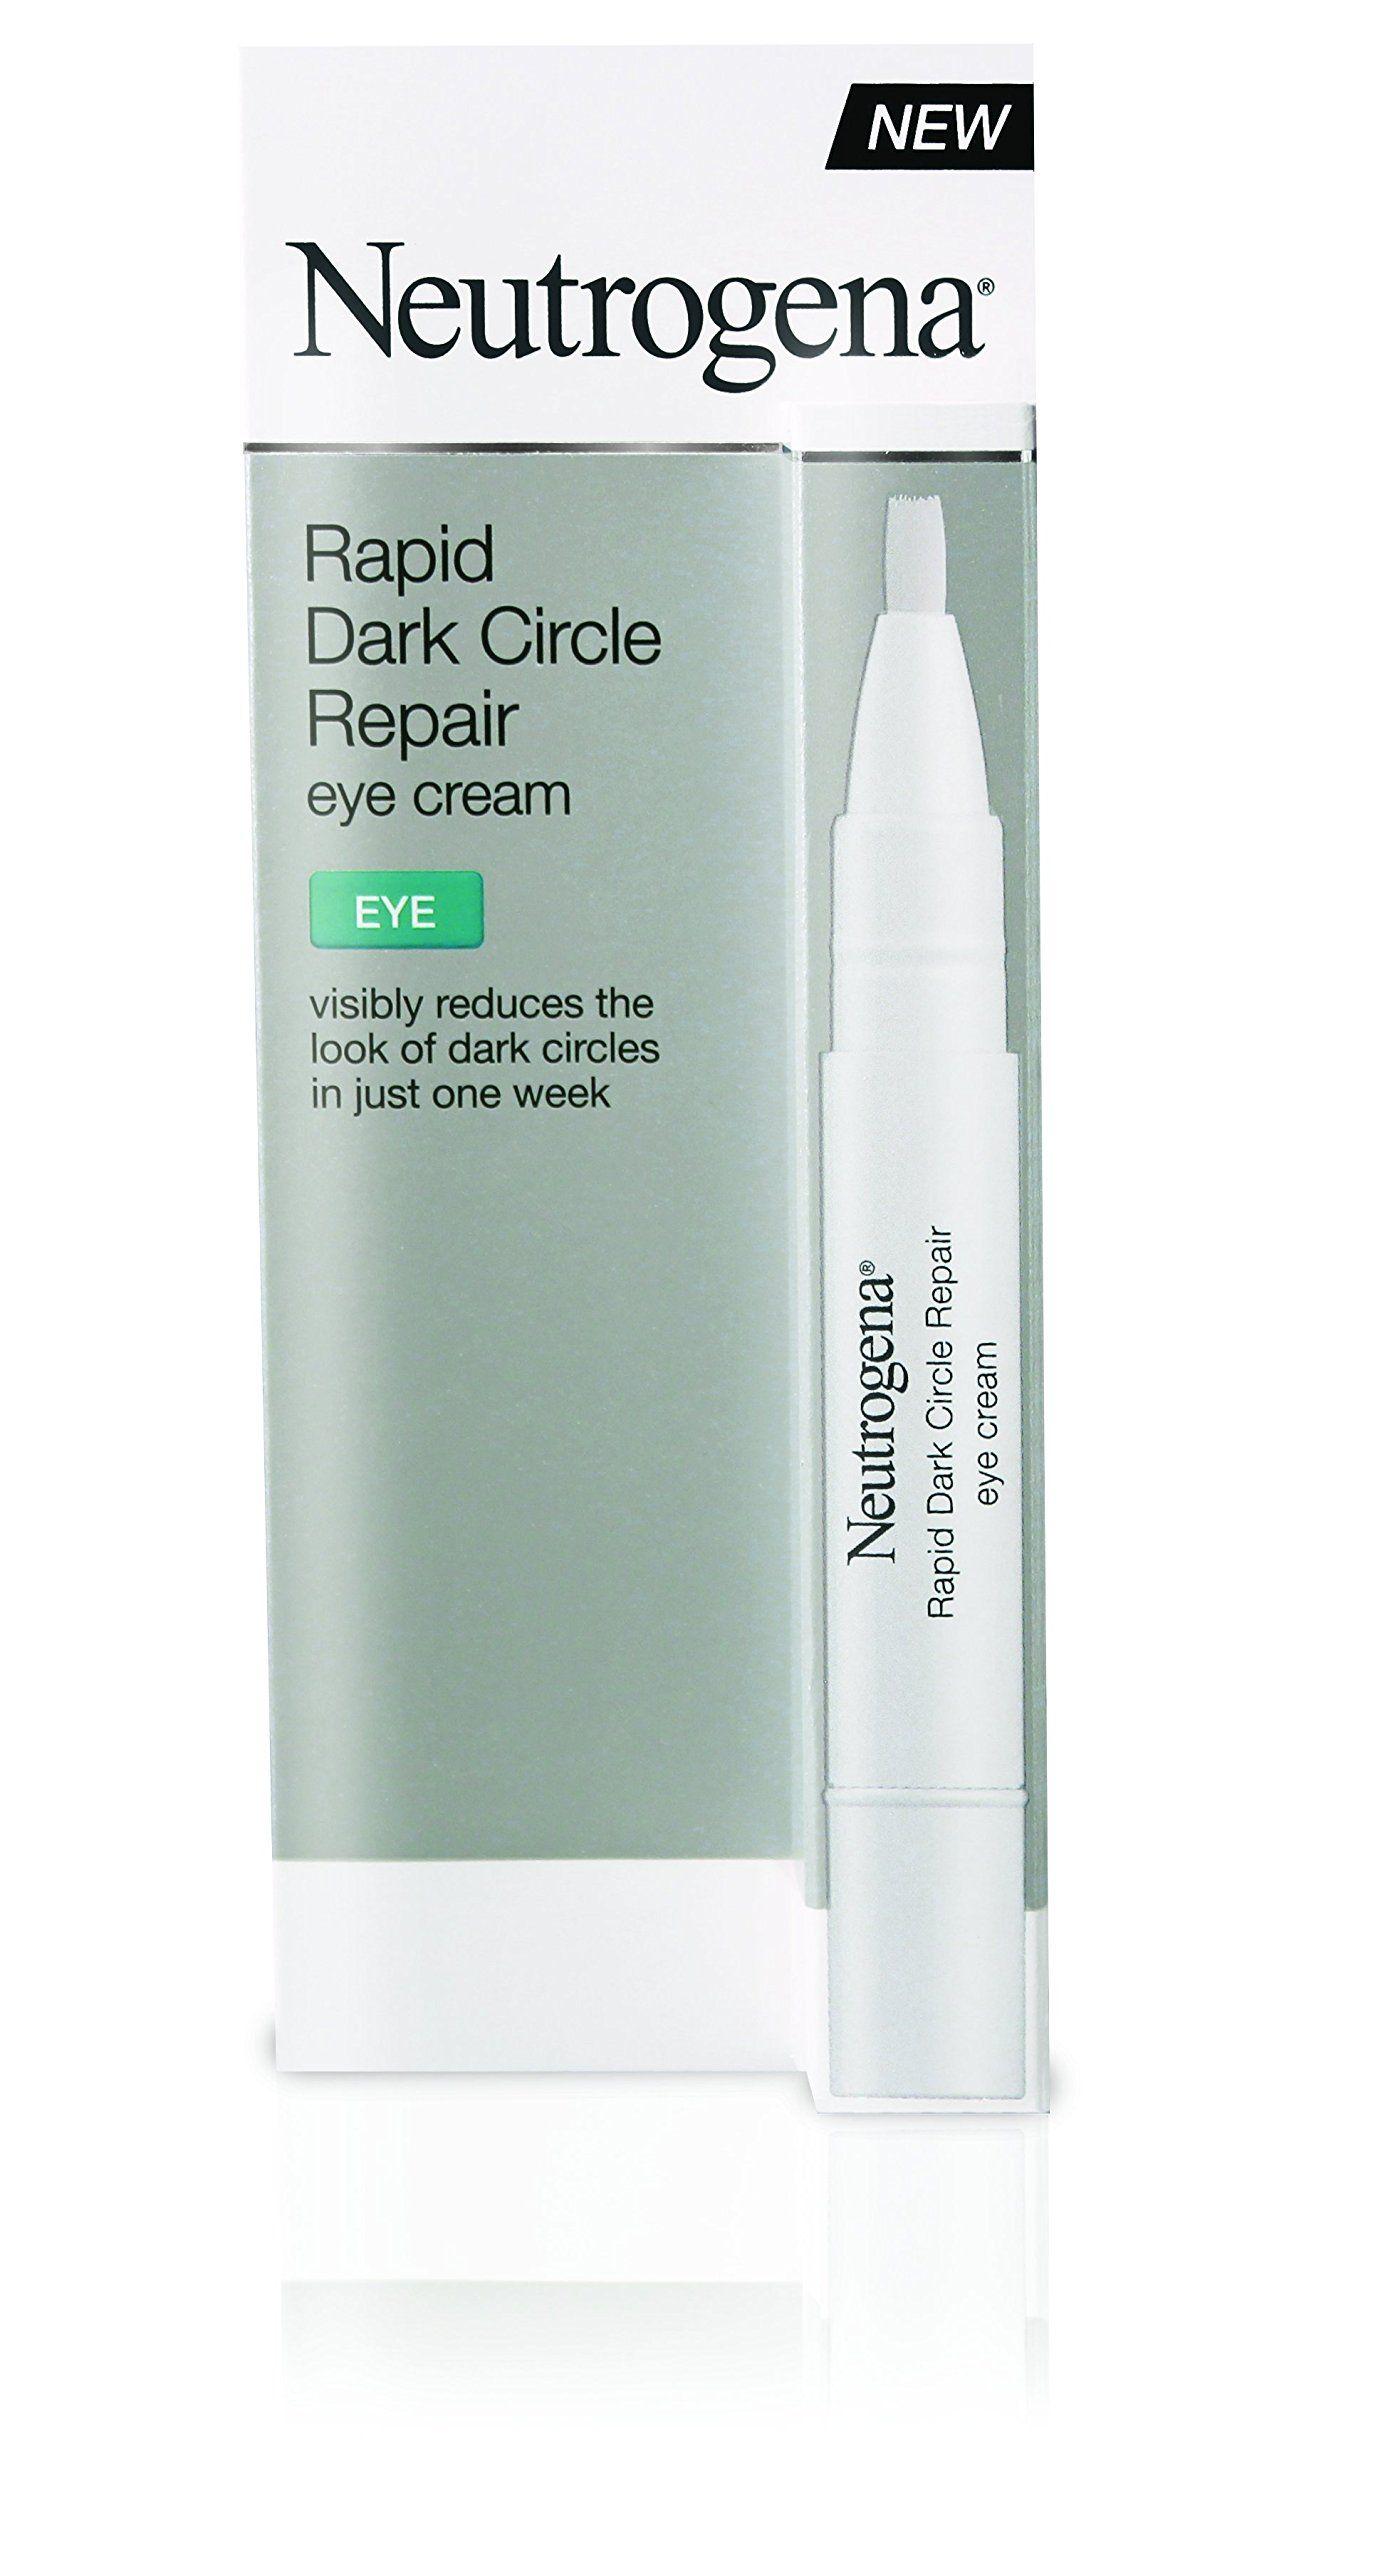 Robot Check Eye Cream For Dark Circles Beauty Skin Eye Wrinkles Remedies